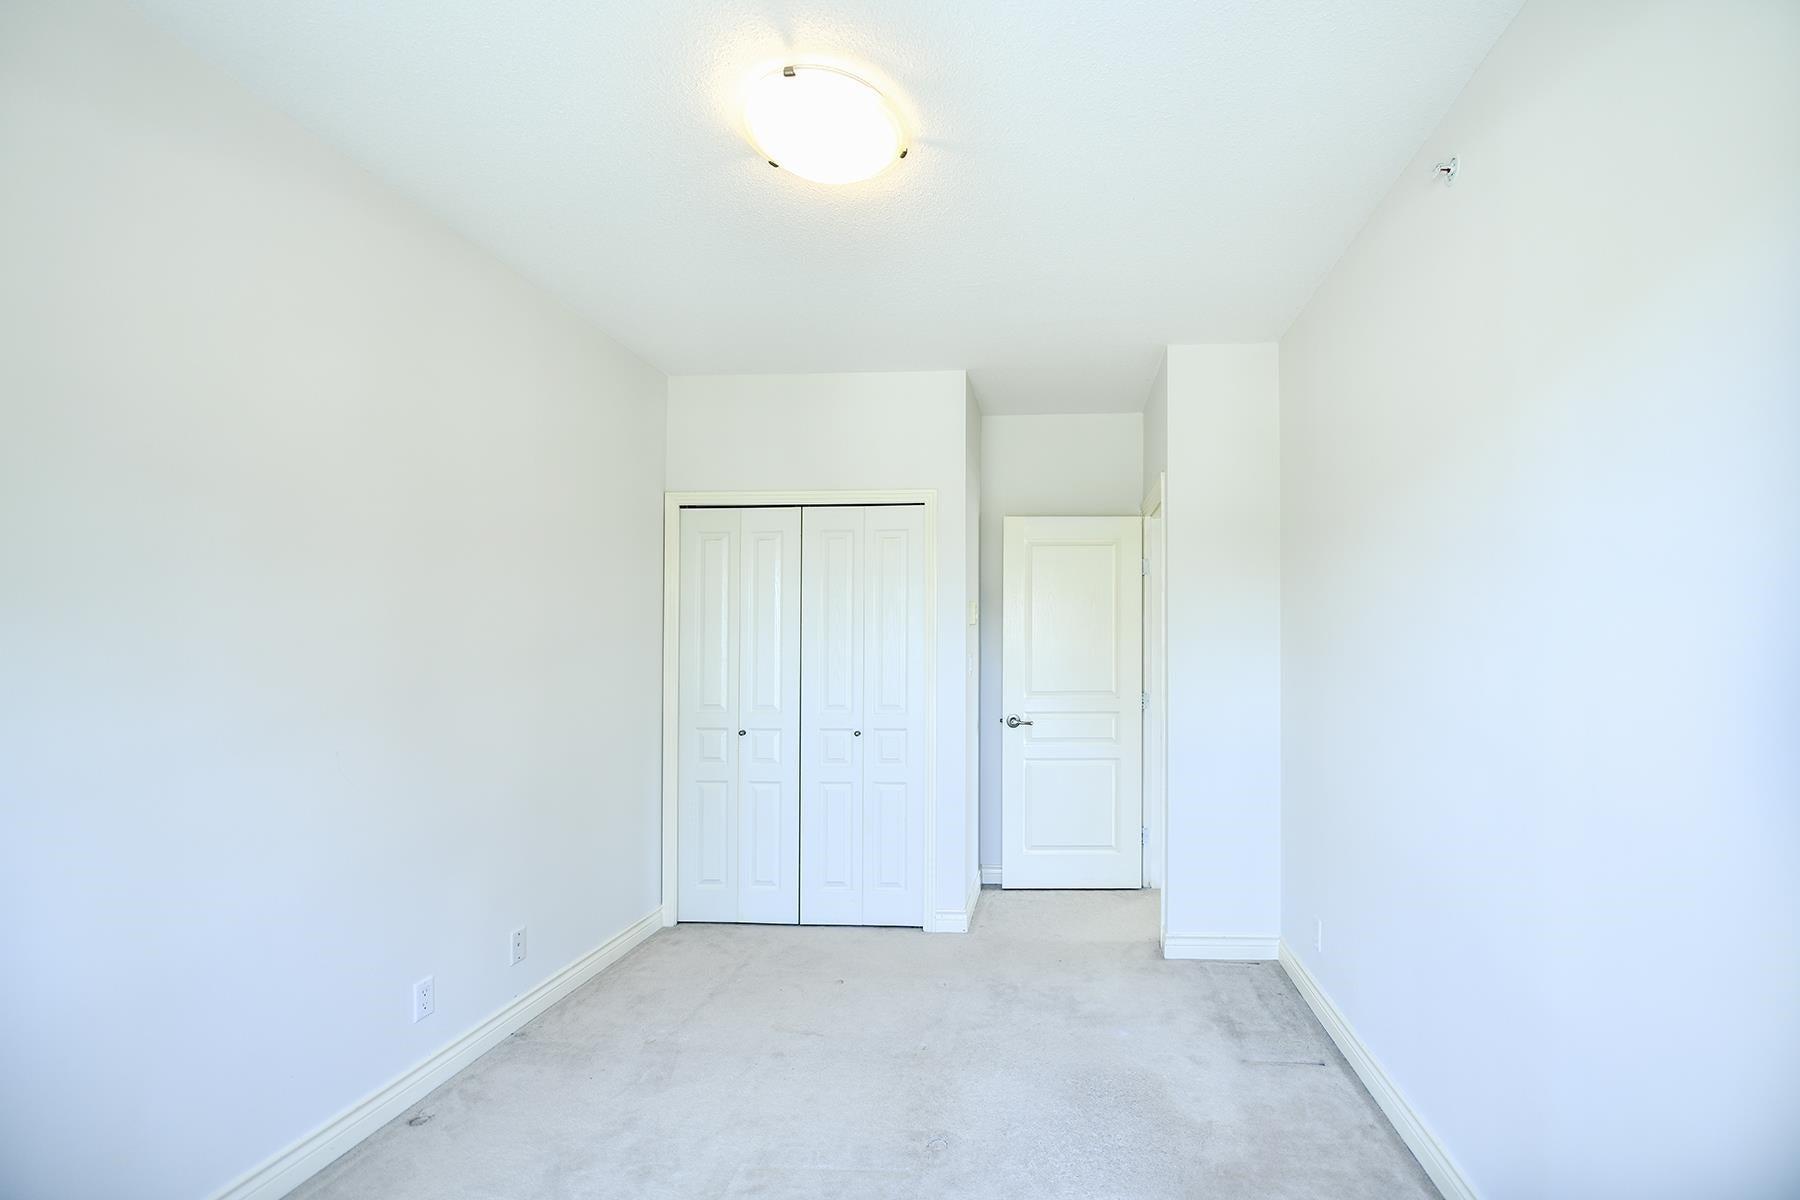 204 5790 EAST BOULEVARD - Kerrisdale Apartment/Condo for sale, 3 Bedrooms (R2604138) - #17